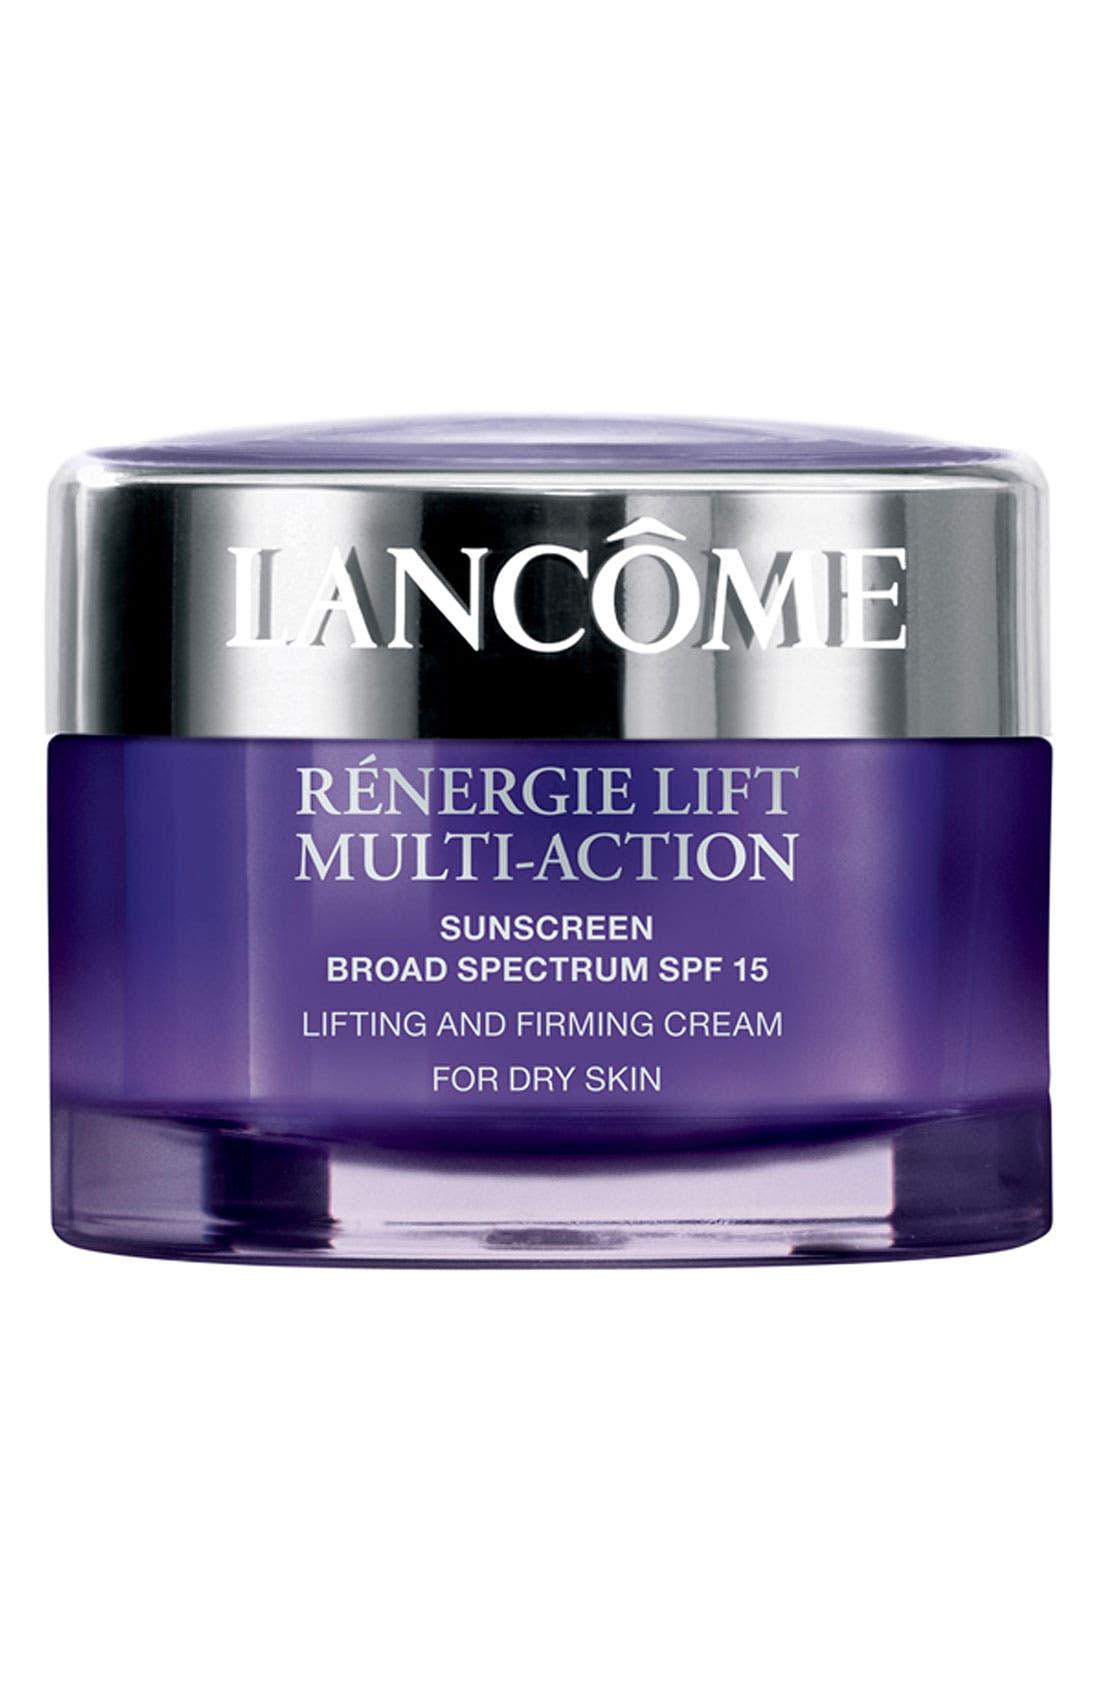 Rénergie Lift Multi Action Moisturizer Cream SPF 15 for Dry Skin,                             Main thumbnail 1, color,                             NO COLOR